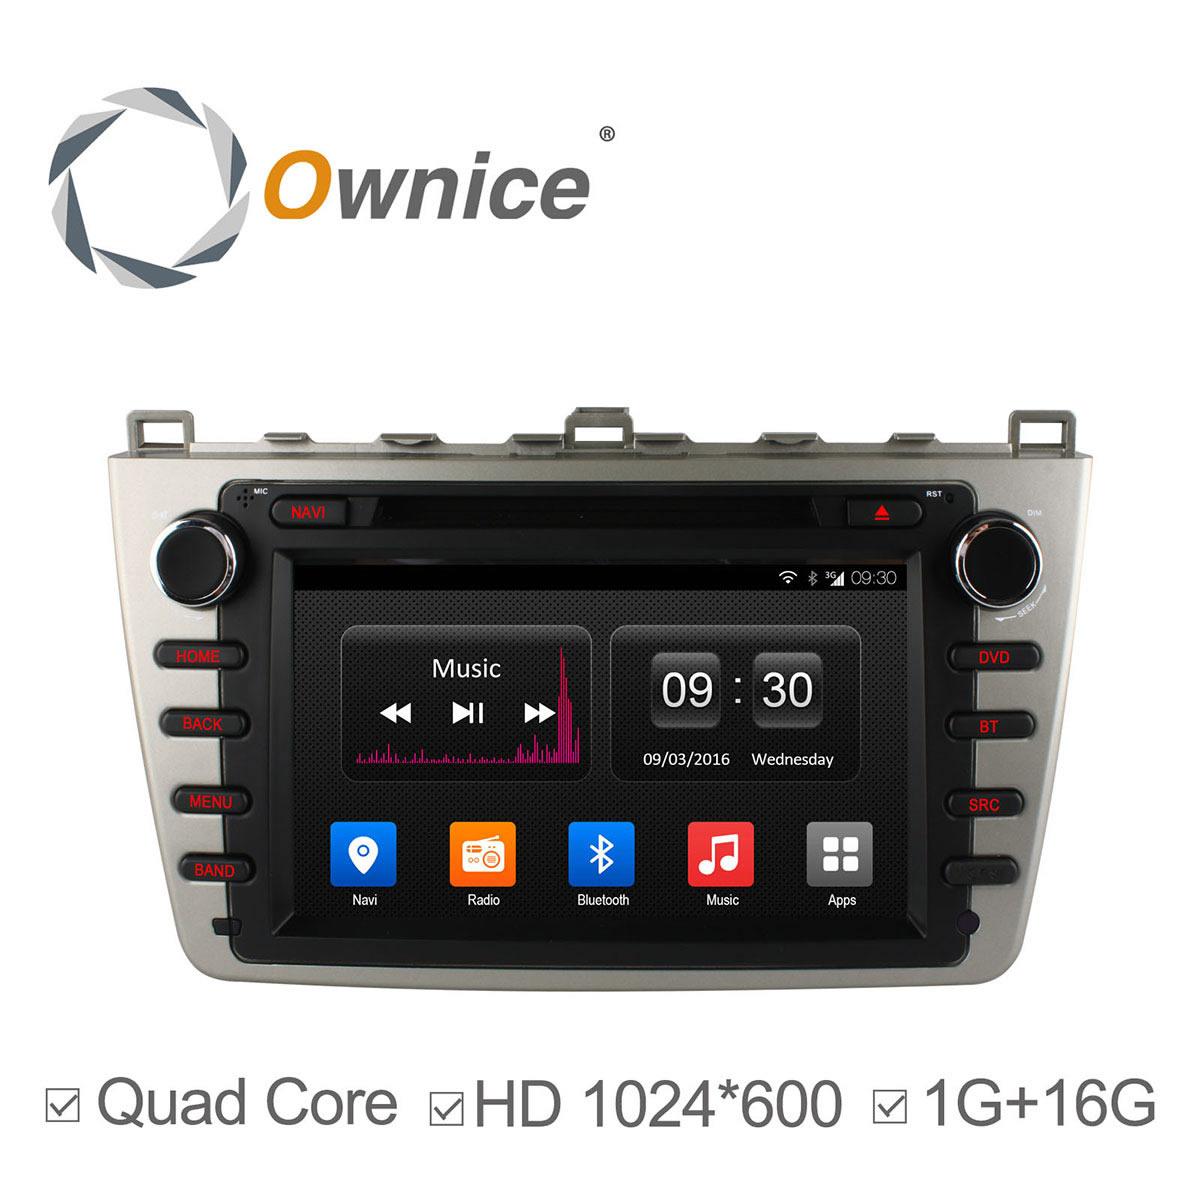 1024*600 ROM 16G Quad Core Android 4.4 FOR MAZDA 6 Ruiyi Ultra 2008 2009 2010 2011 2012 Car DVD Player GPS Radio wifi DAB+ DVR(China (Mainland))